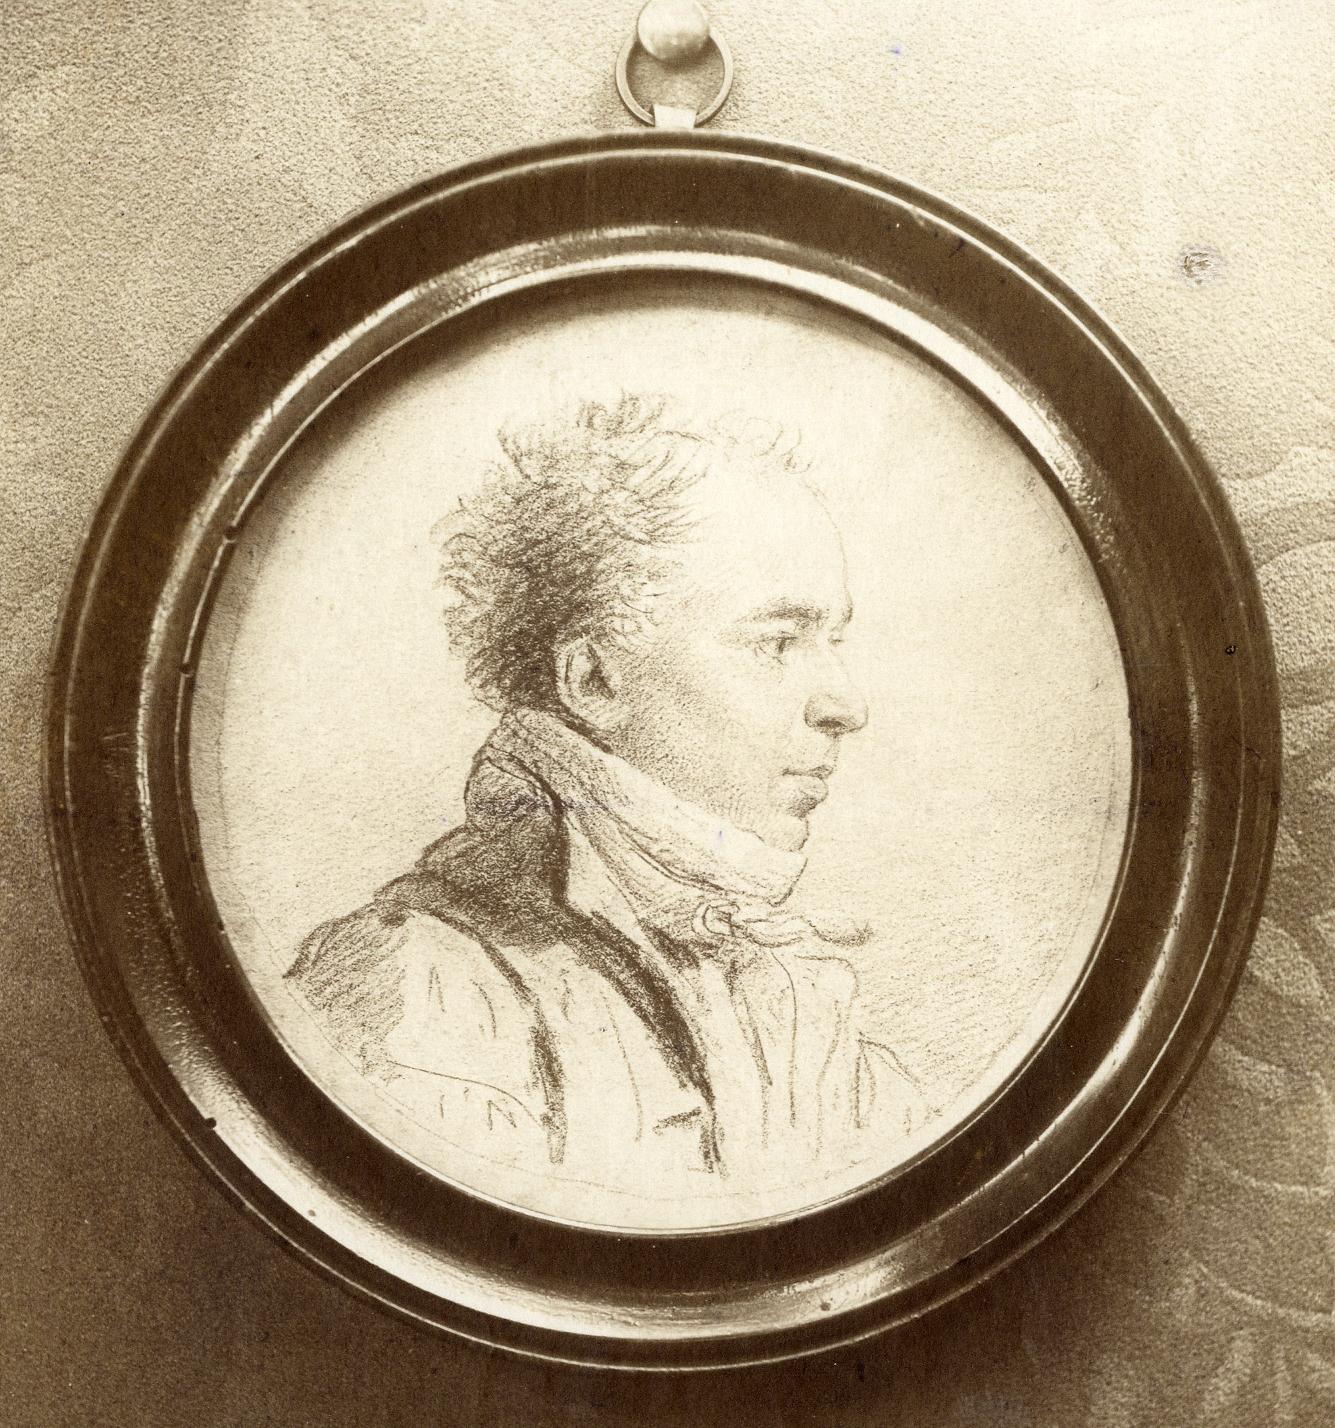 Ms-1848-64-Félix-Desbordes-père-photo-dessin-C.-Desbordes